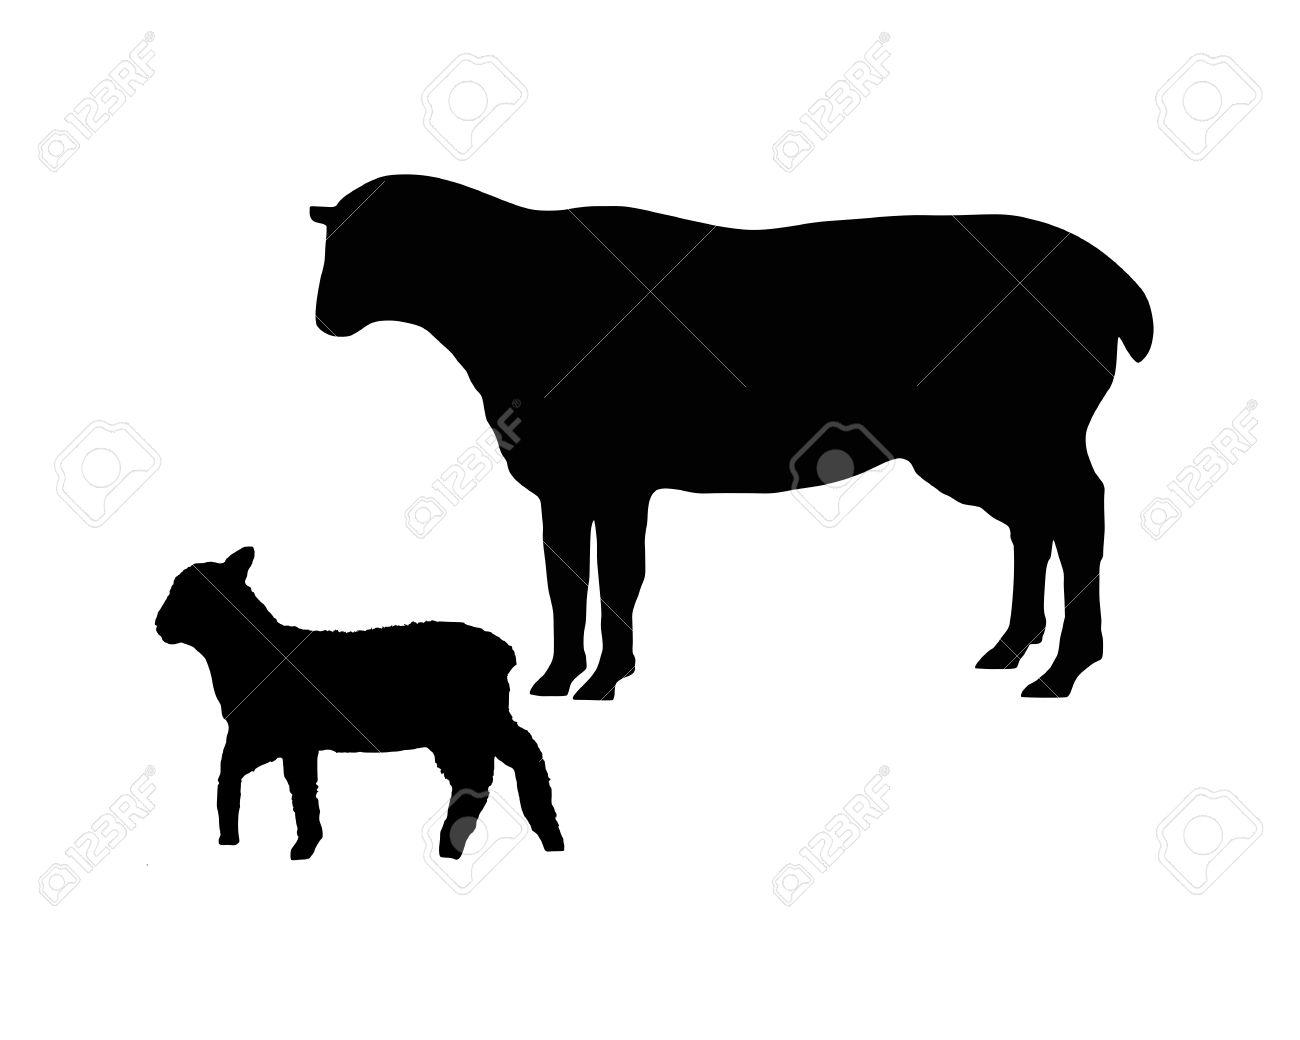 black sheep images u0026 stock pictures royalty free black sheep